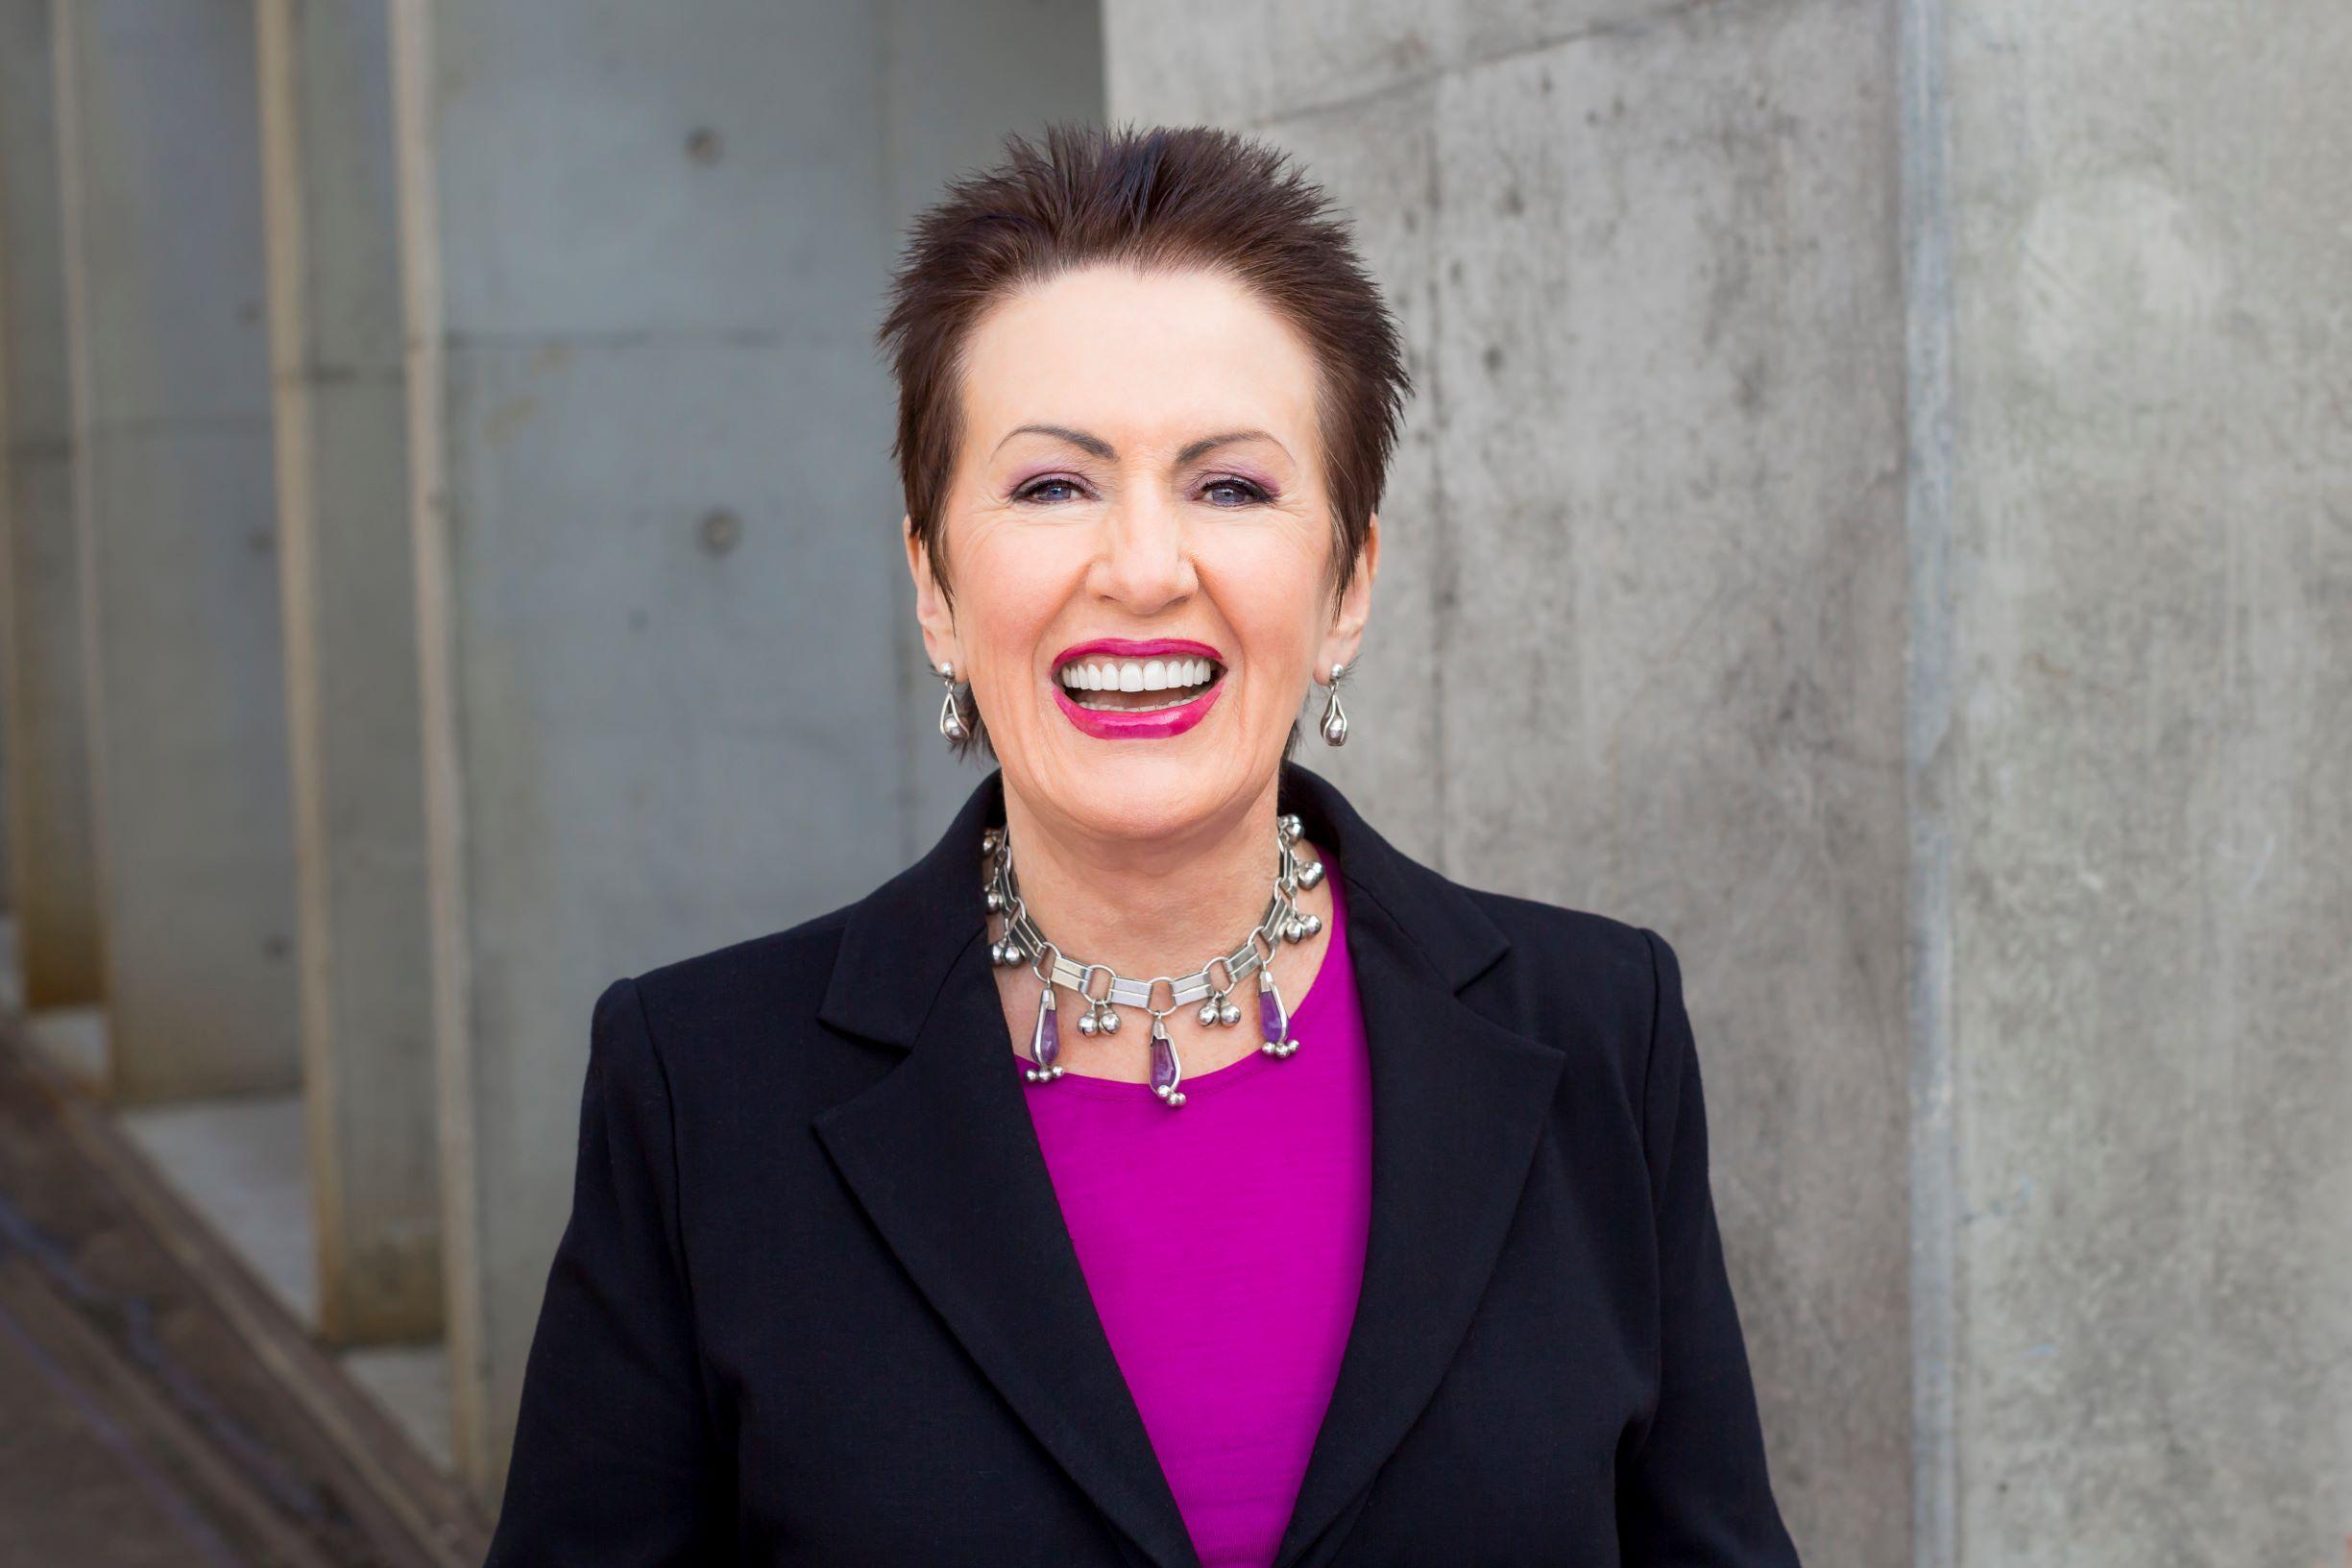 Saluting Sydney Women 2019